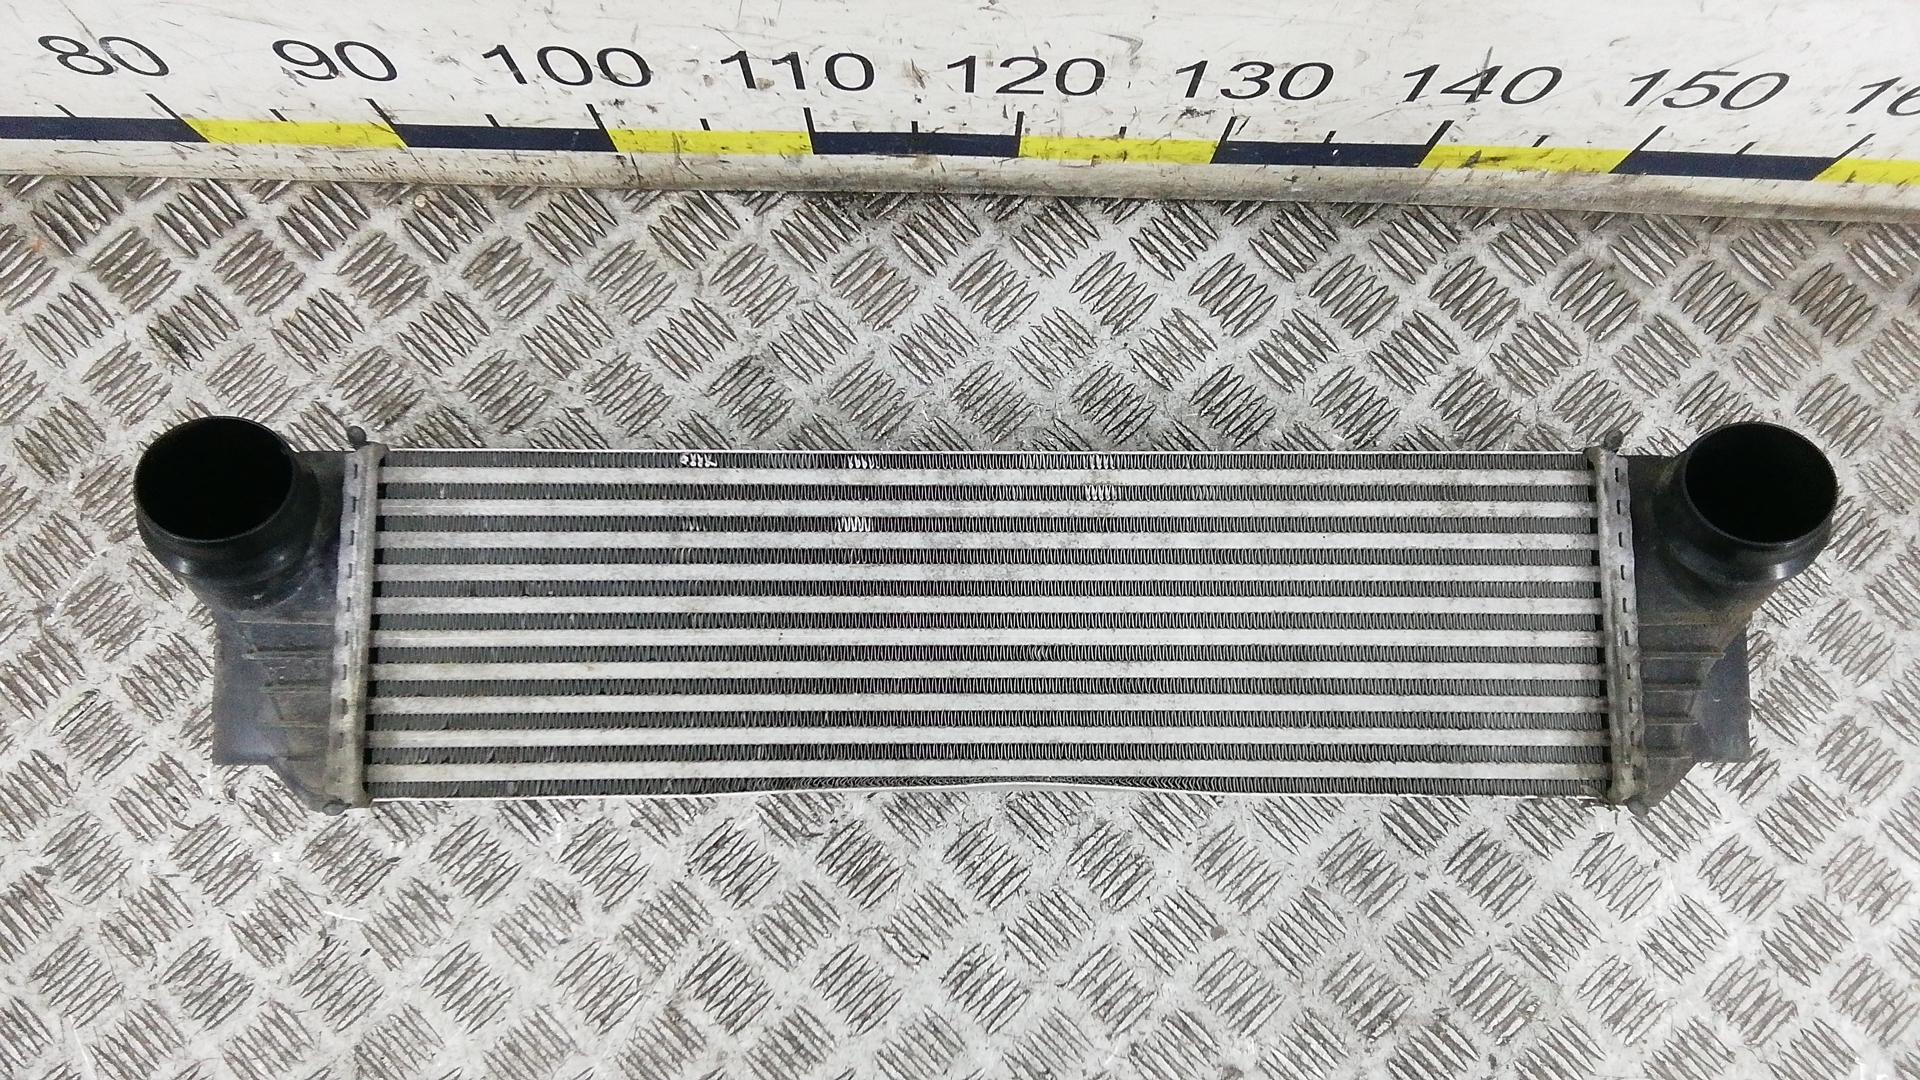 Радиатор интеркуллера, BMW, 5 F10/F11, 2013